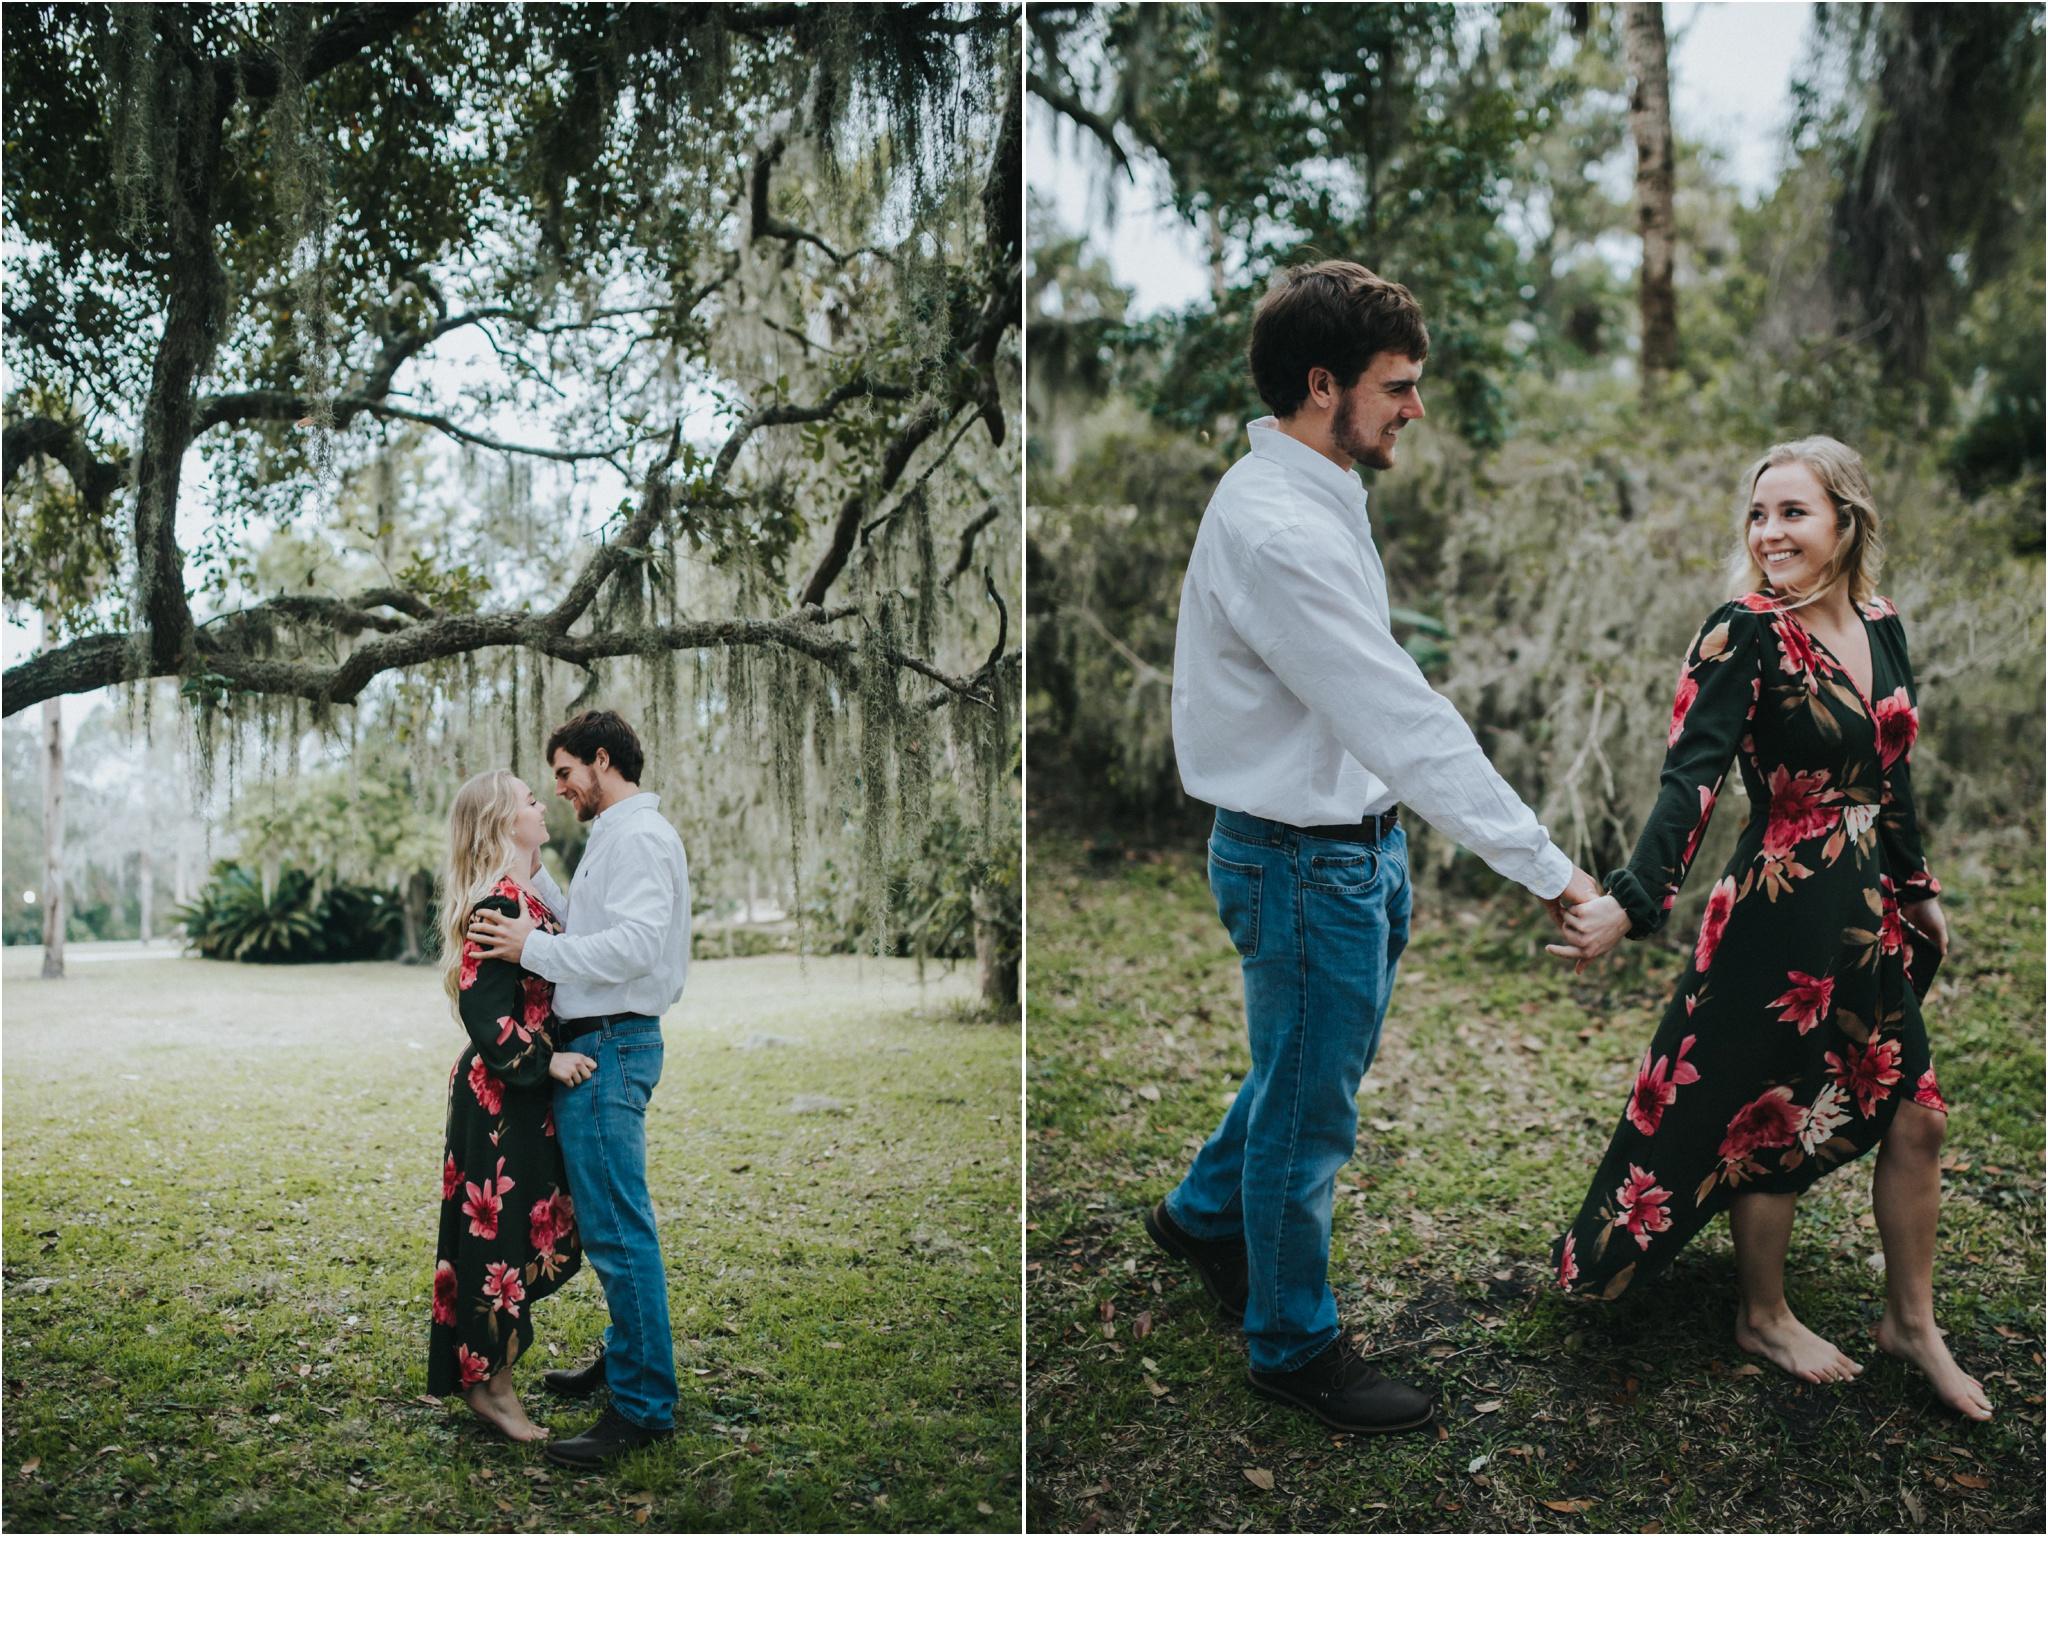 Rainey_Gregg_Photography_St._Simons_Island_Georgia_California_Wedding_Portrait_Photography_0709.jpg